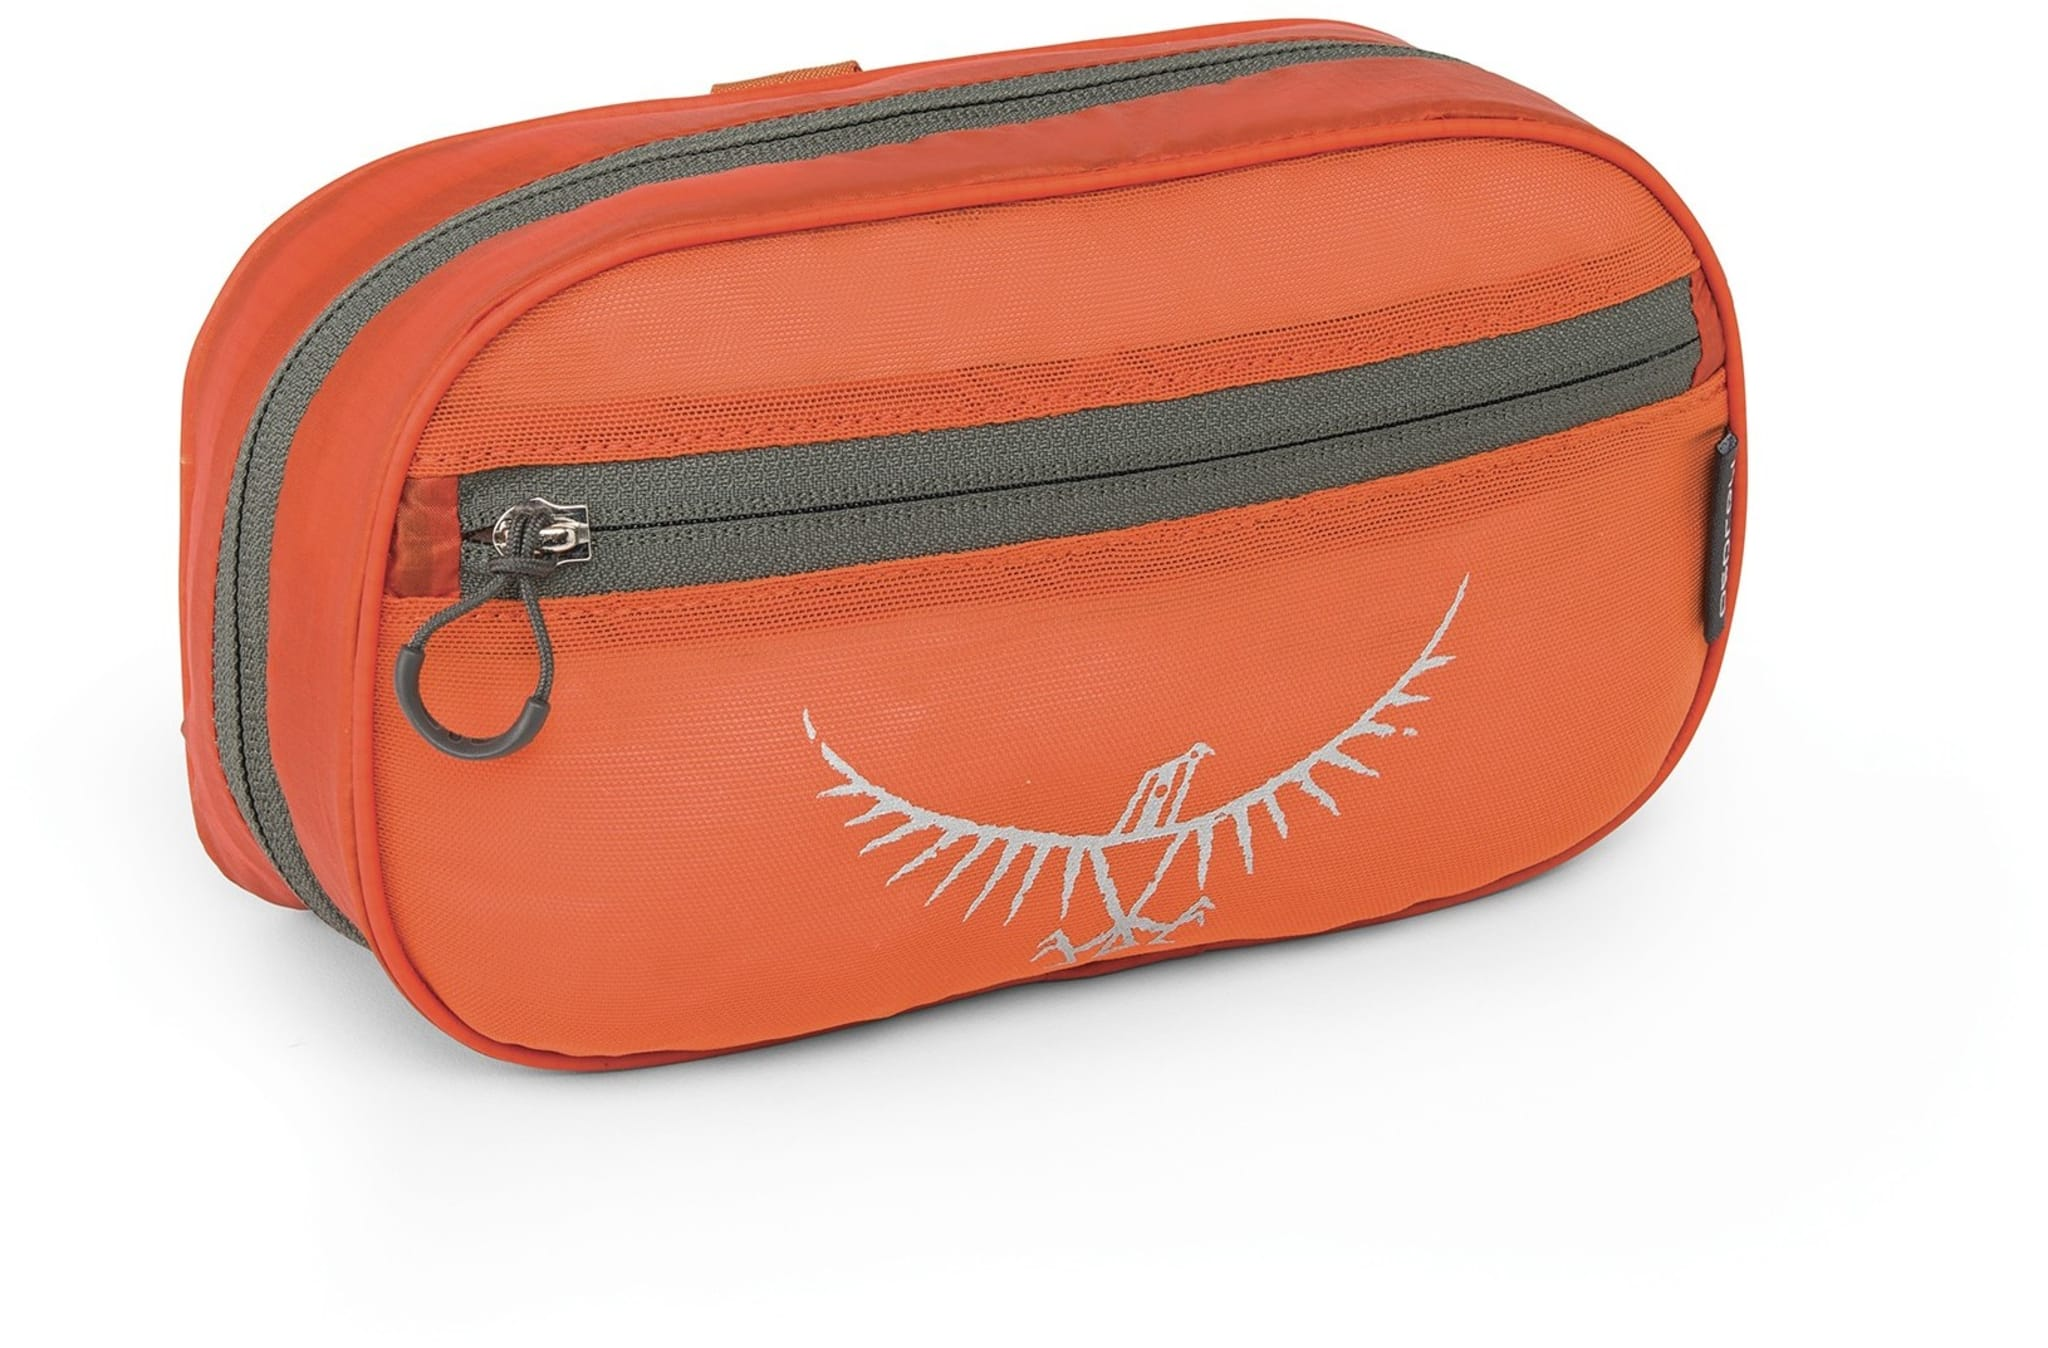 UL Wash Bag Zip